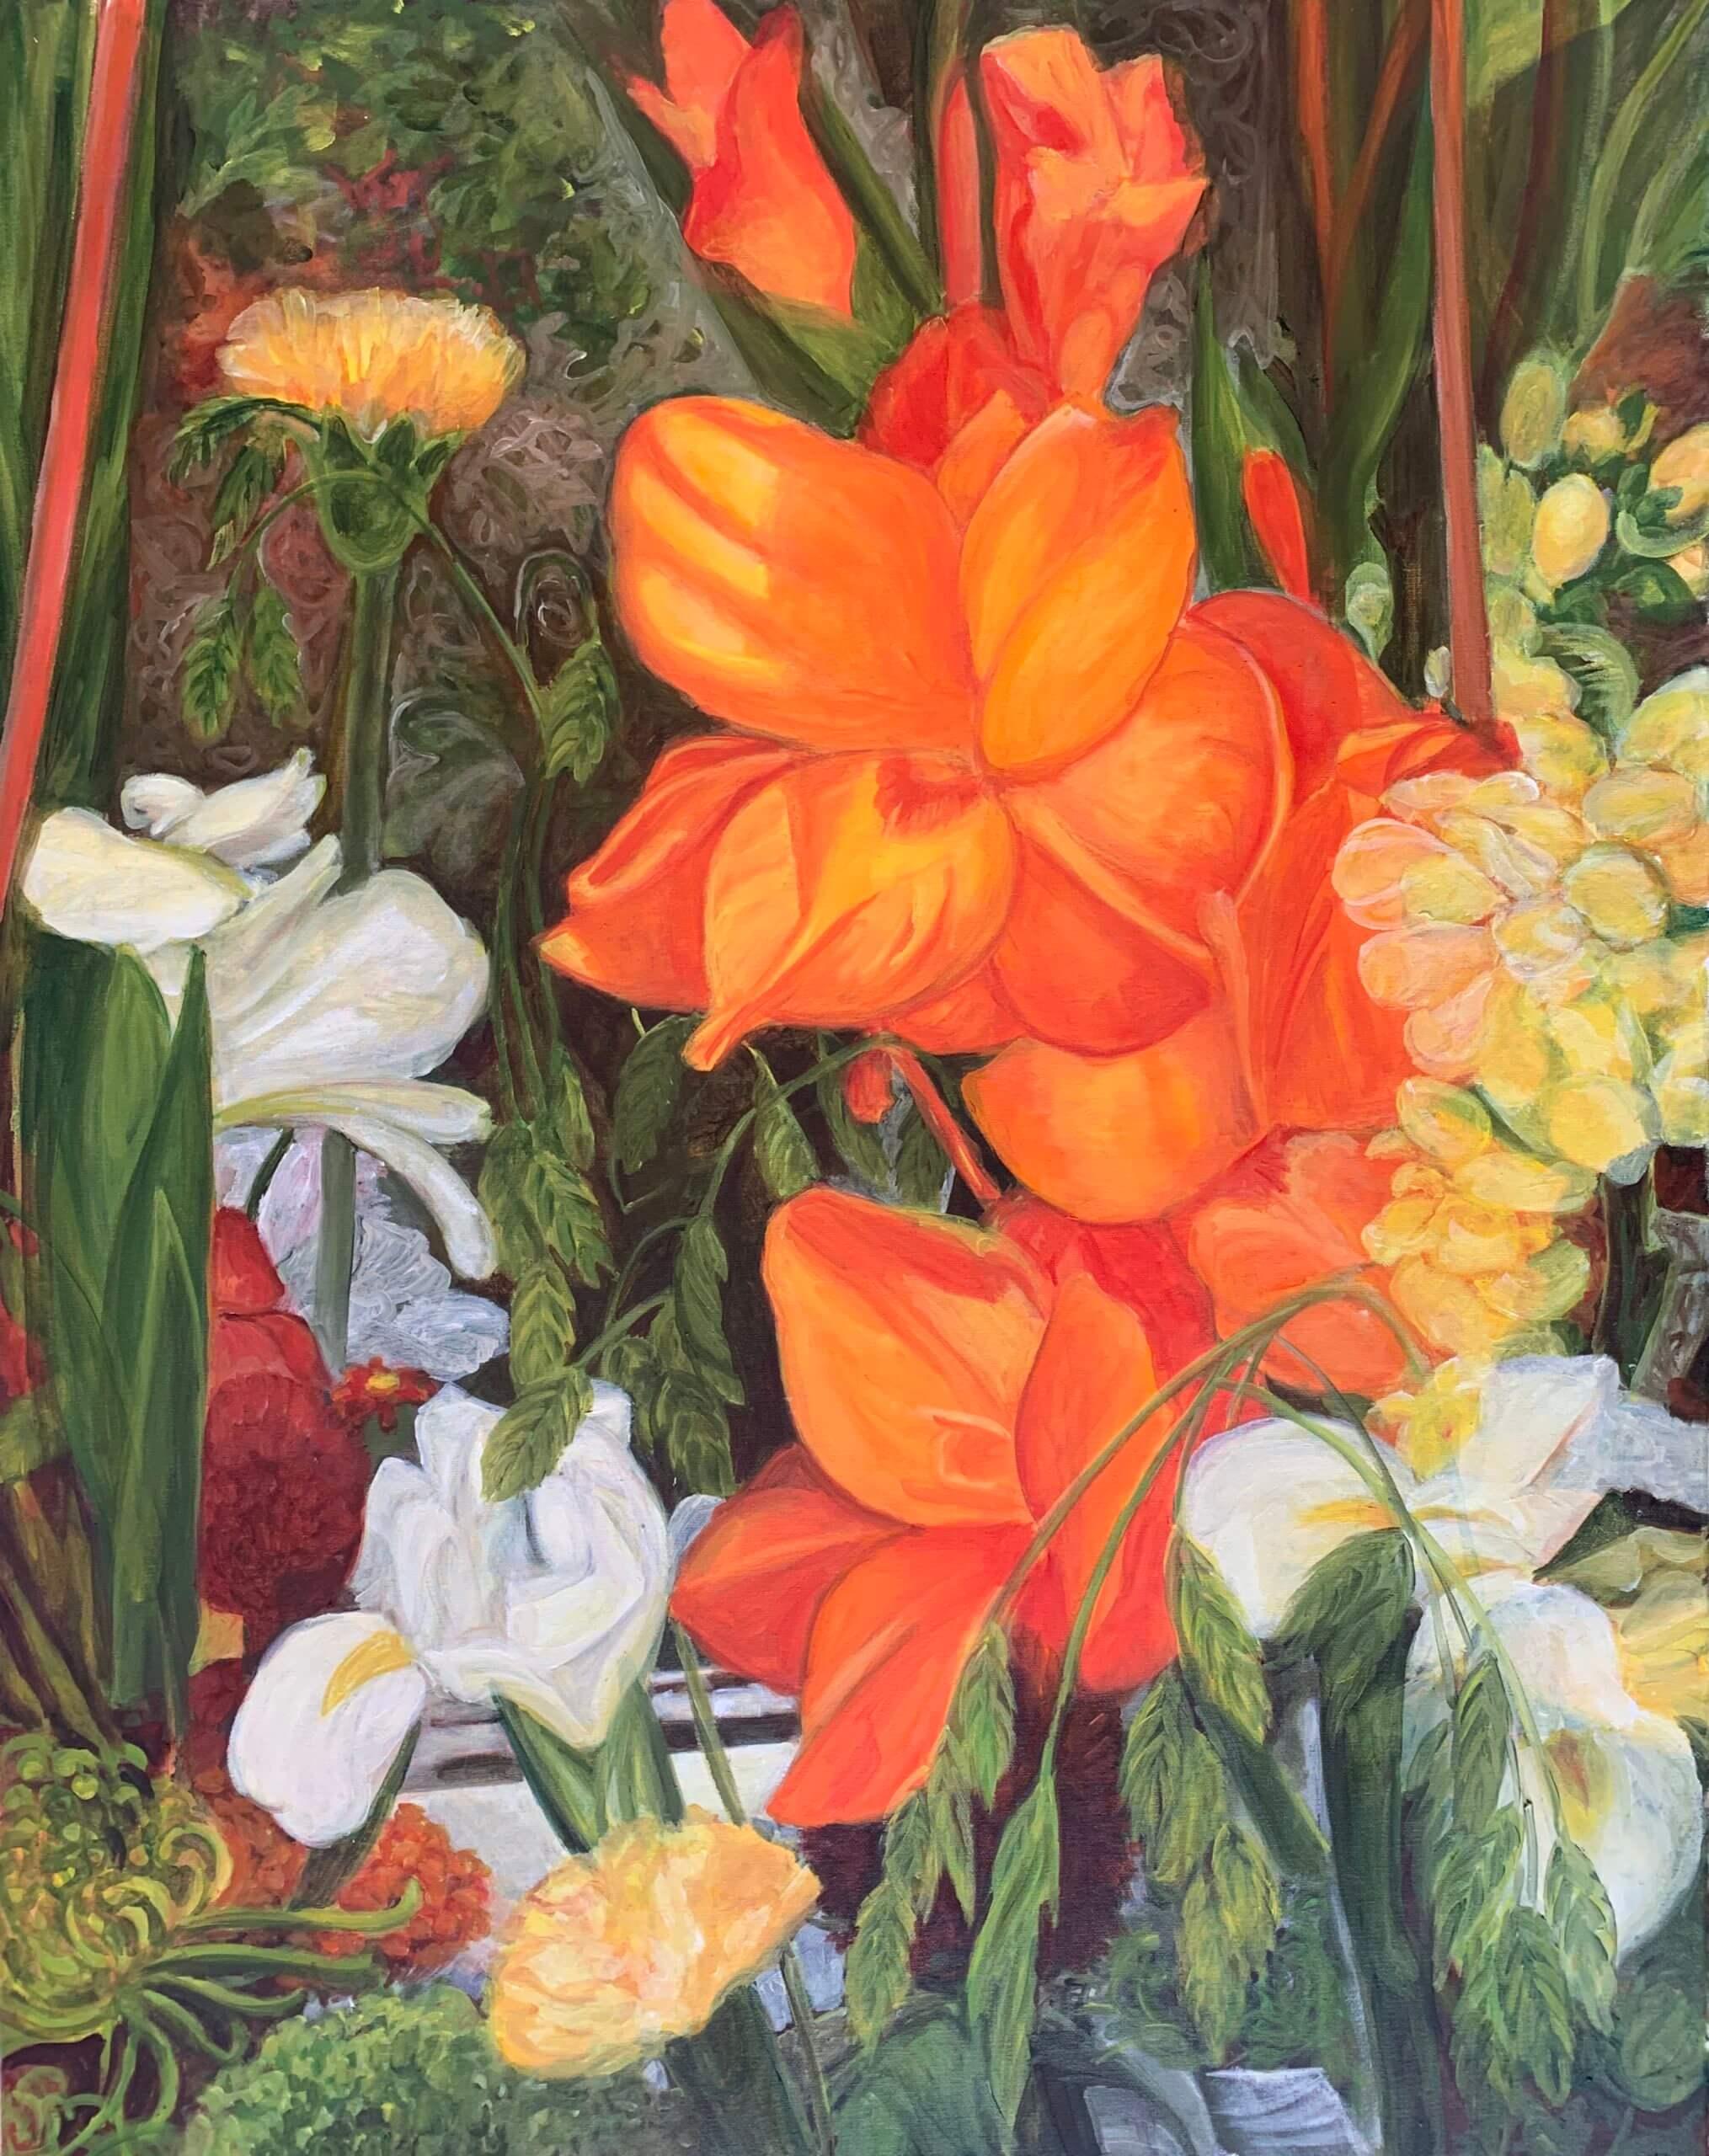 Lilien, 80x60 cm, 2019, Öl auf Leinwand Tatjana Meier